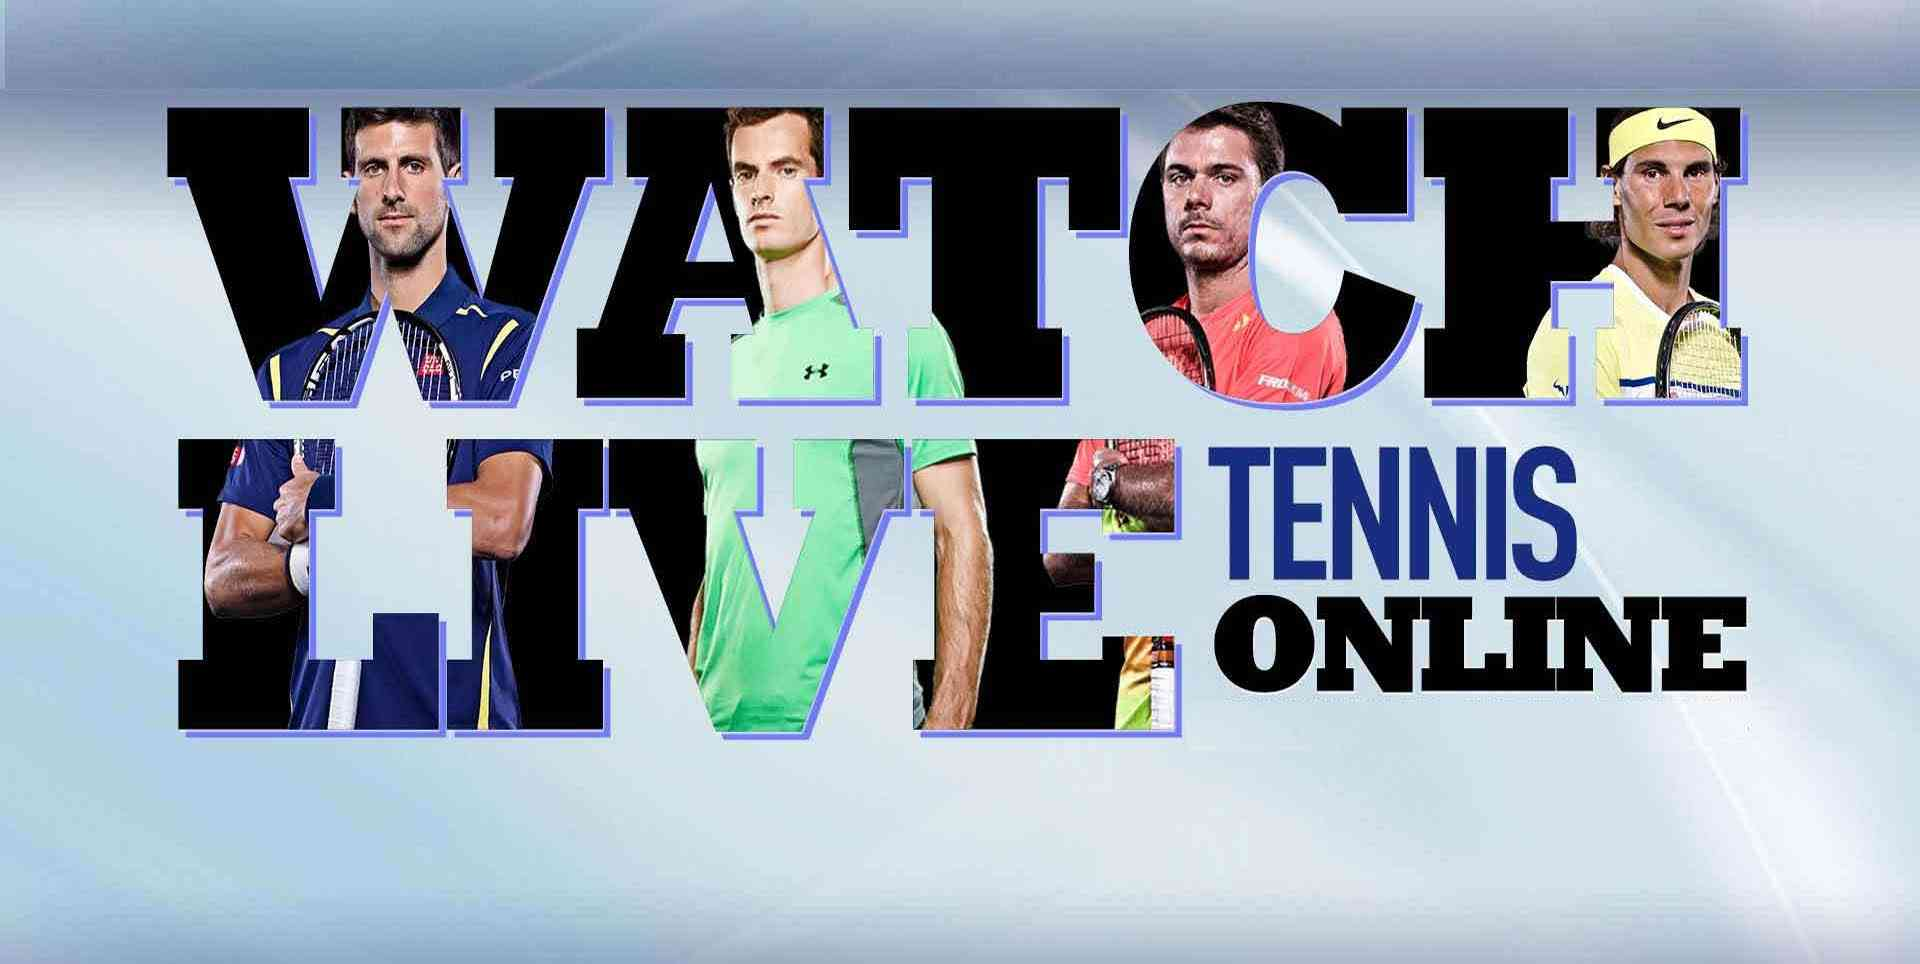 Watch A. Petkovic vs P. Ormaechea Quarterfinals Online 2013